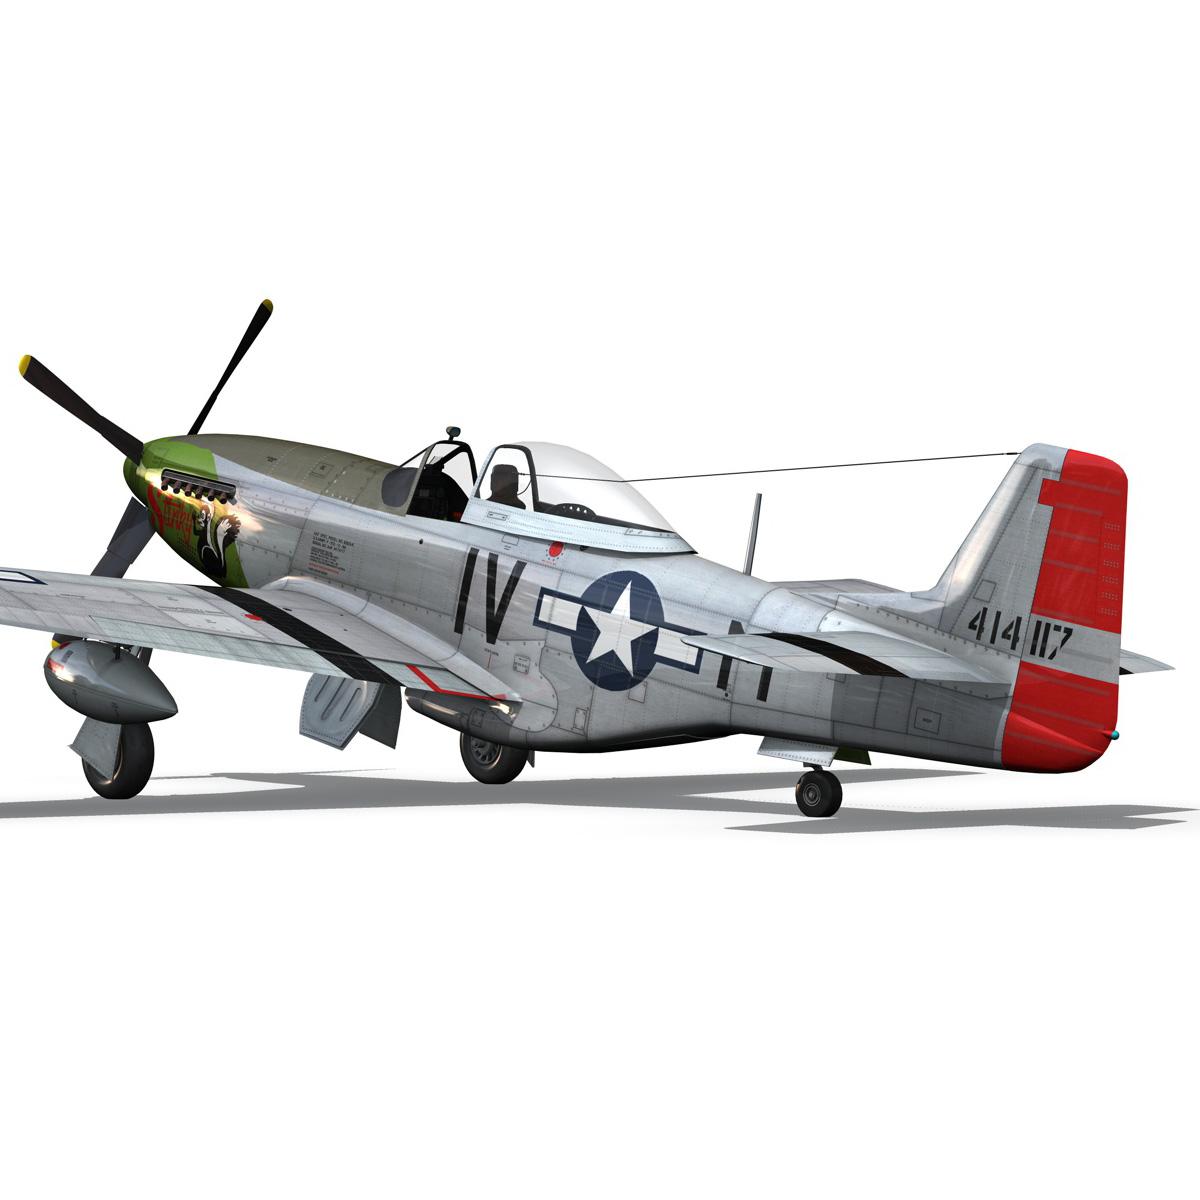 north american p-51d mustang – stinky 3d model fbx c4d lwo obj 269606